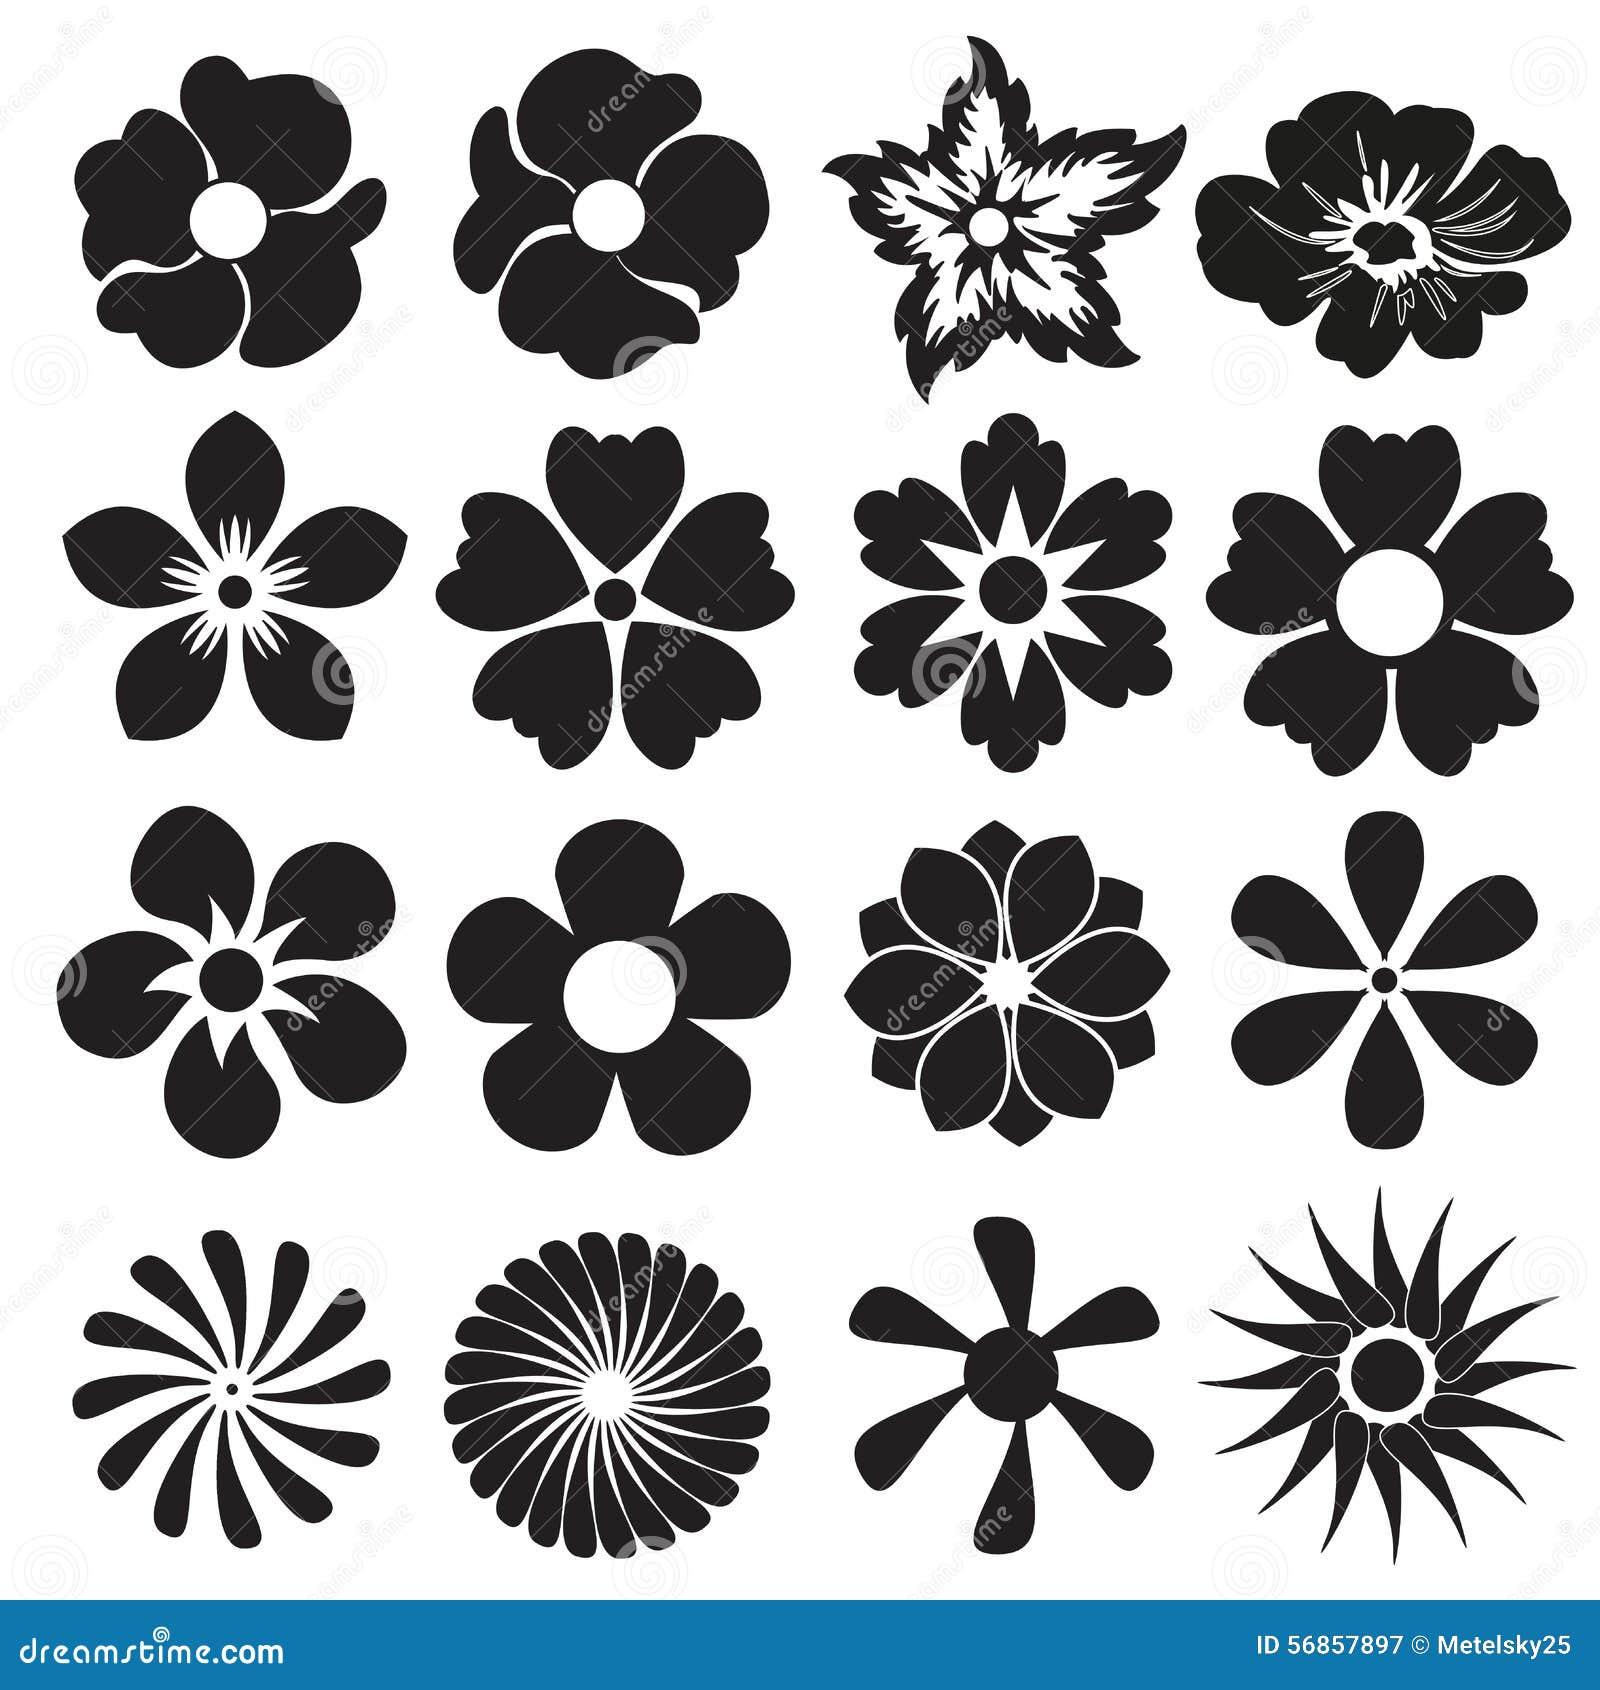 Set Of Black Flower Design Elements Stock Vector: Flower Icon Or Sign Set. Vector Design Elements. Stock